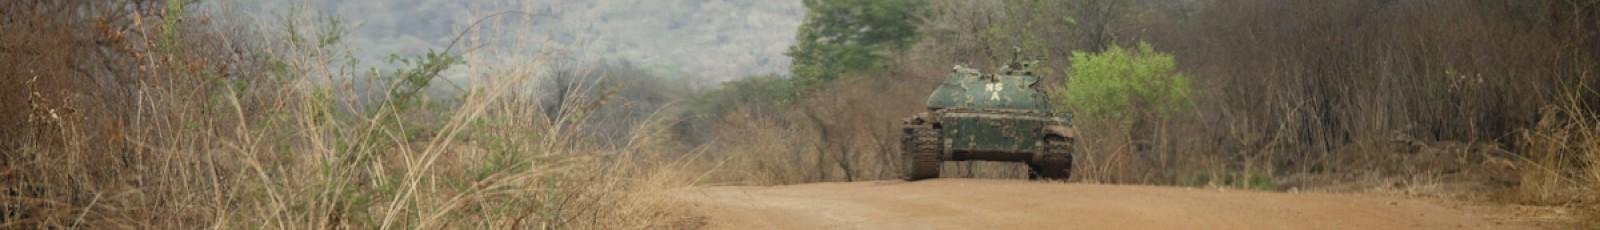 Tank along the road between Torit and Juba, South Sudan